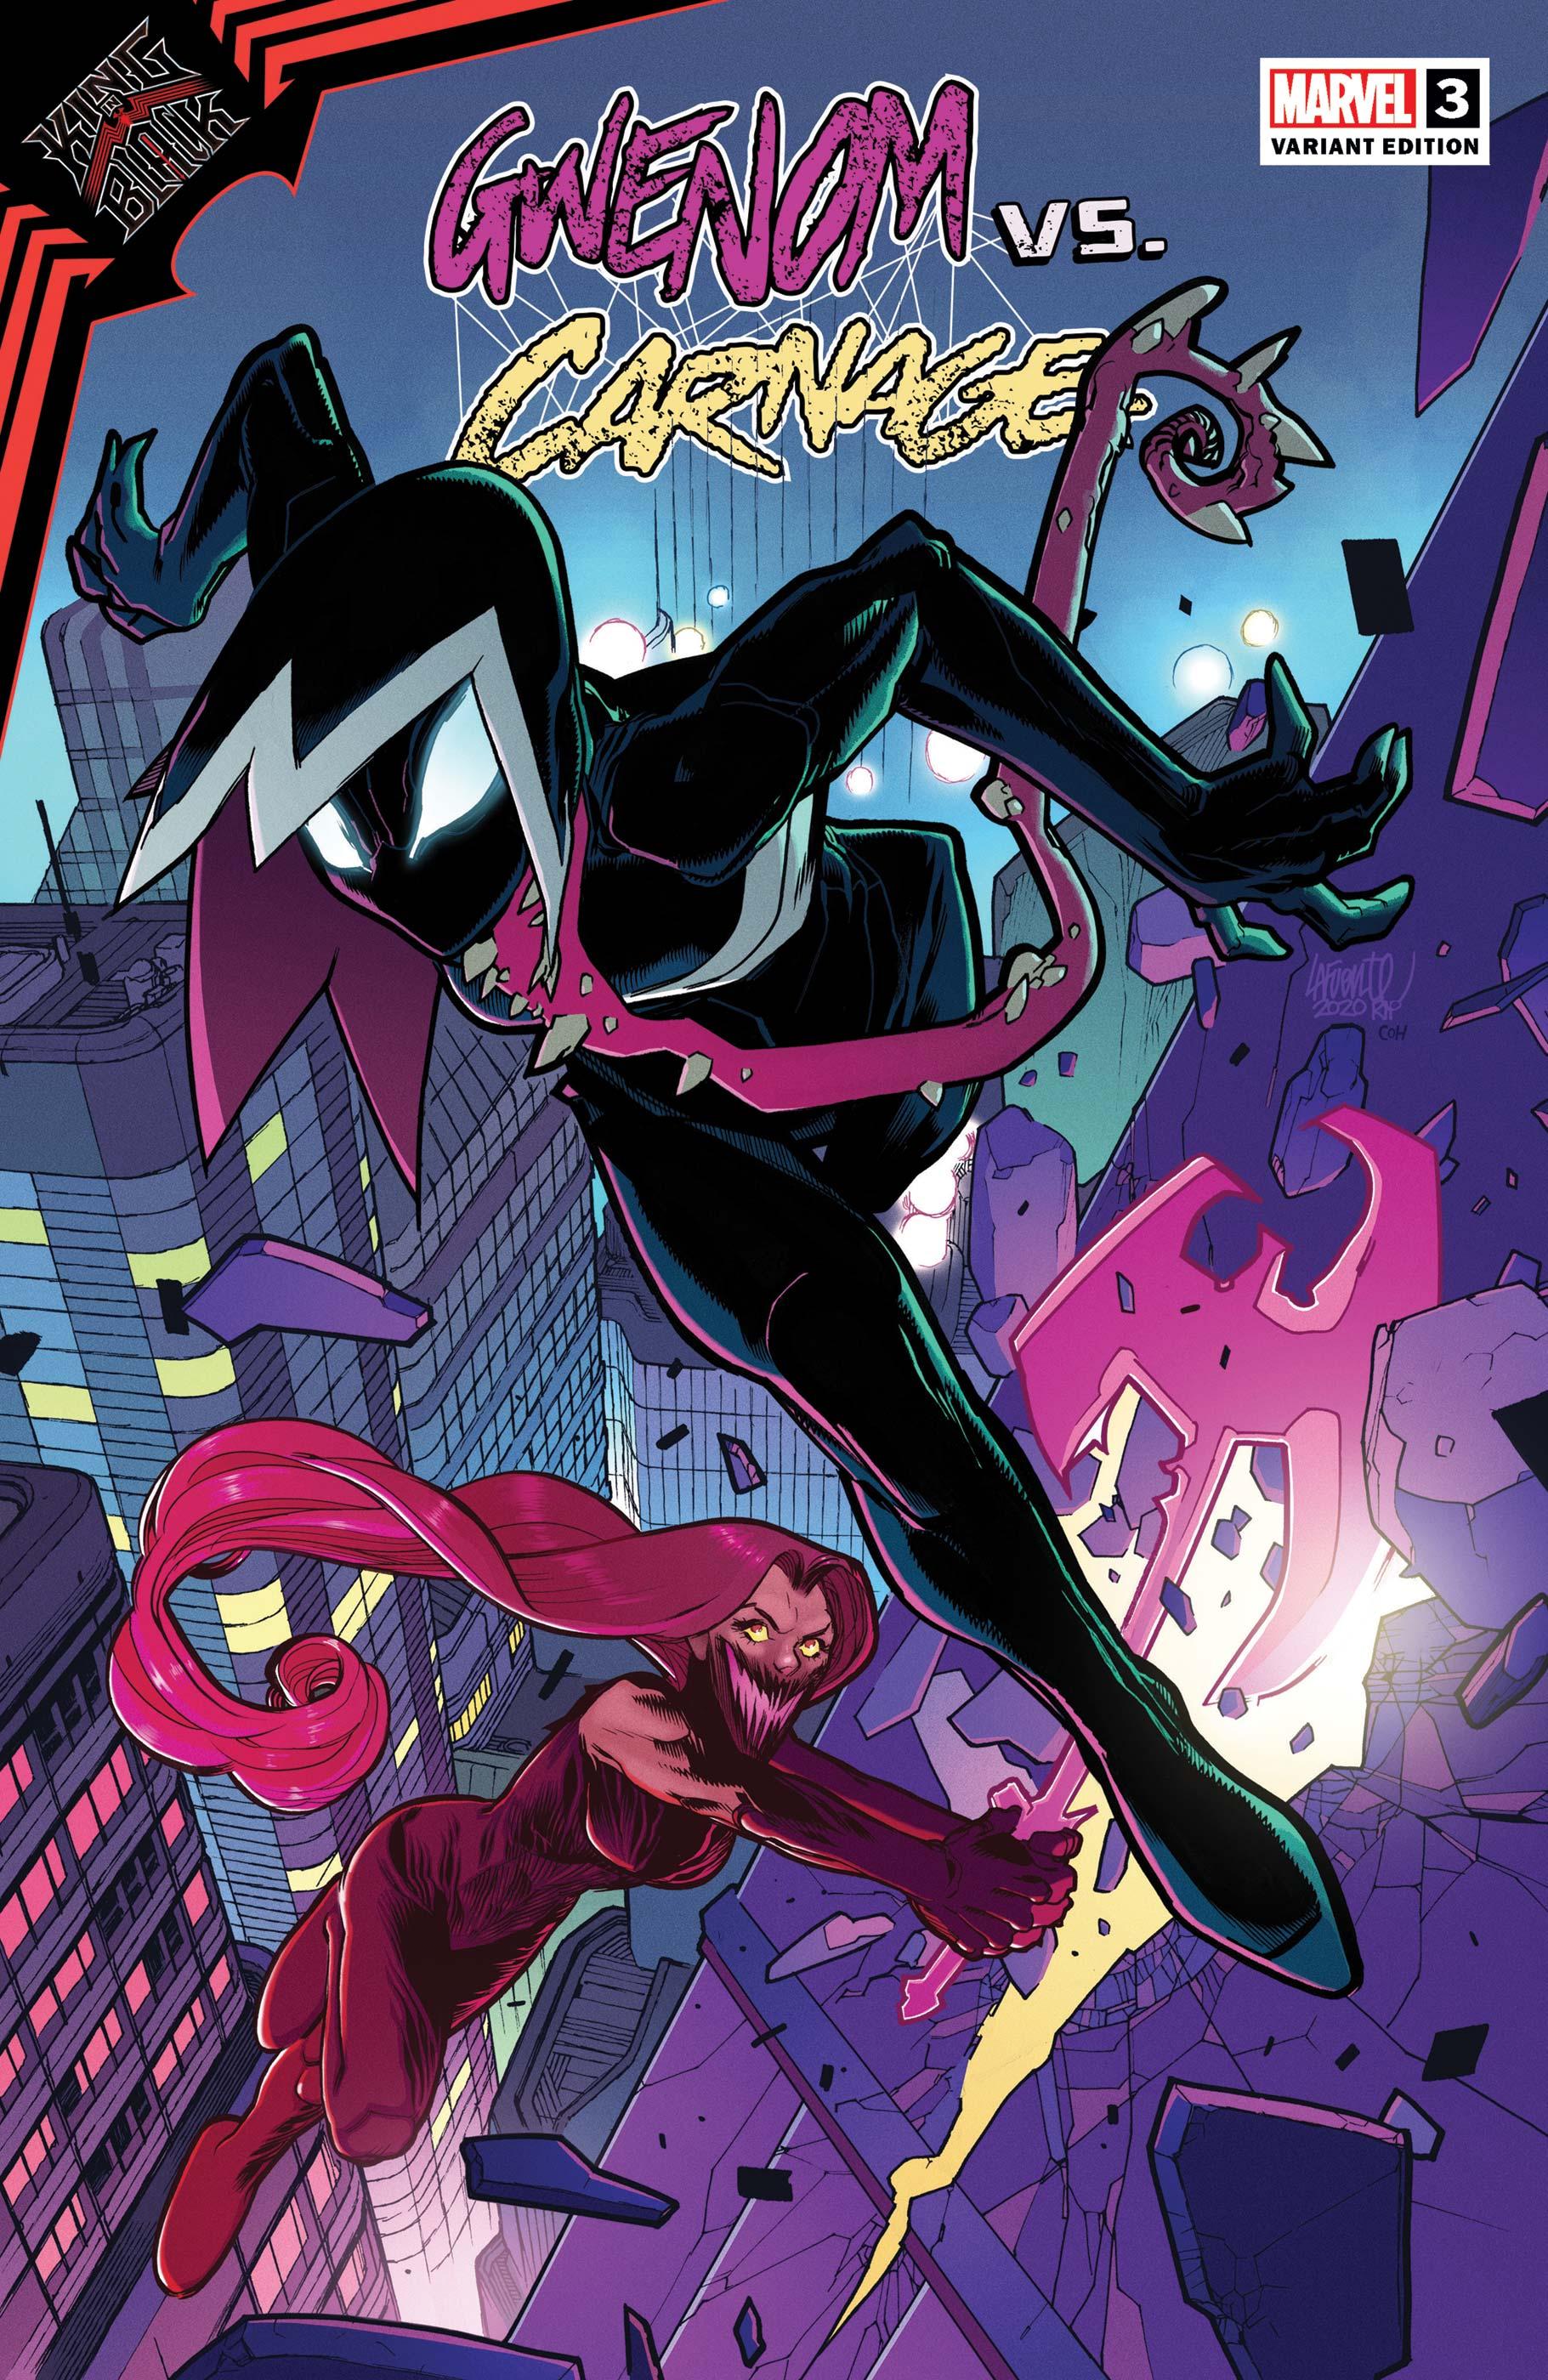 King in Black: Gwenom Vs. Carnage (2021) #3 (Variant)